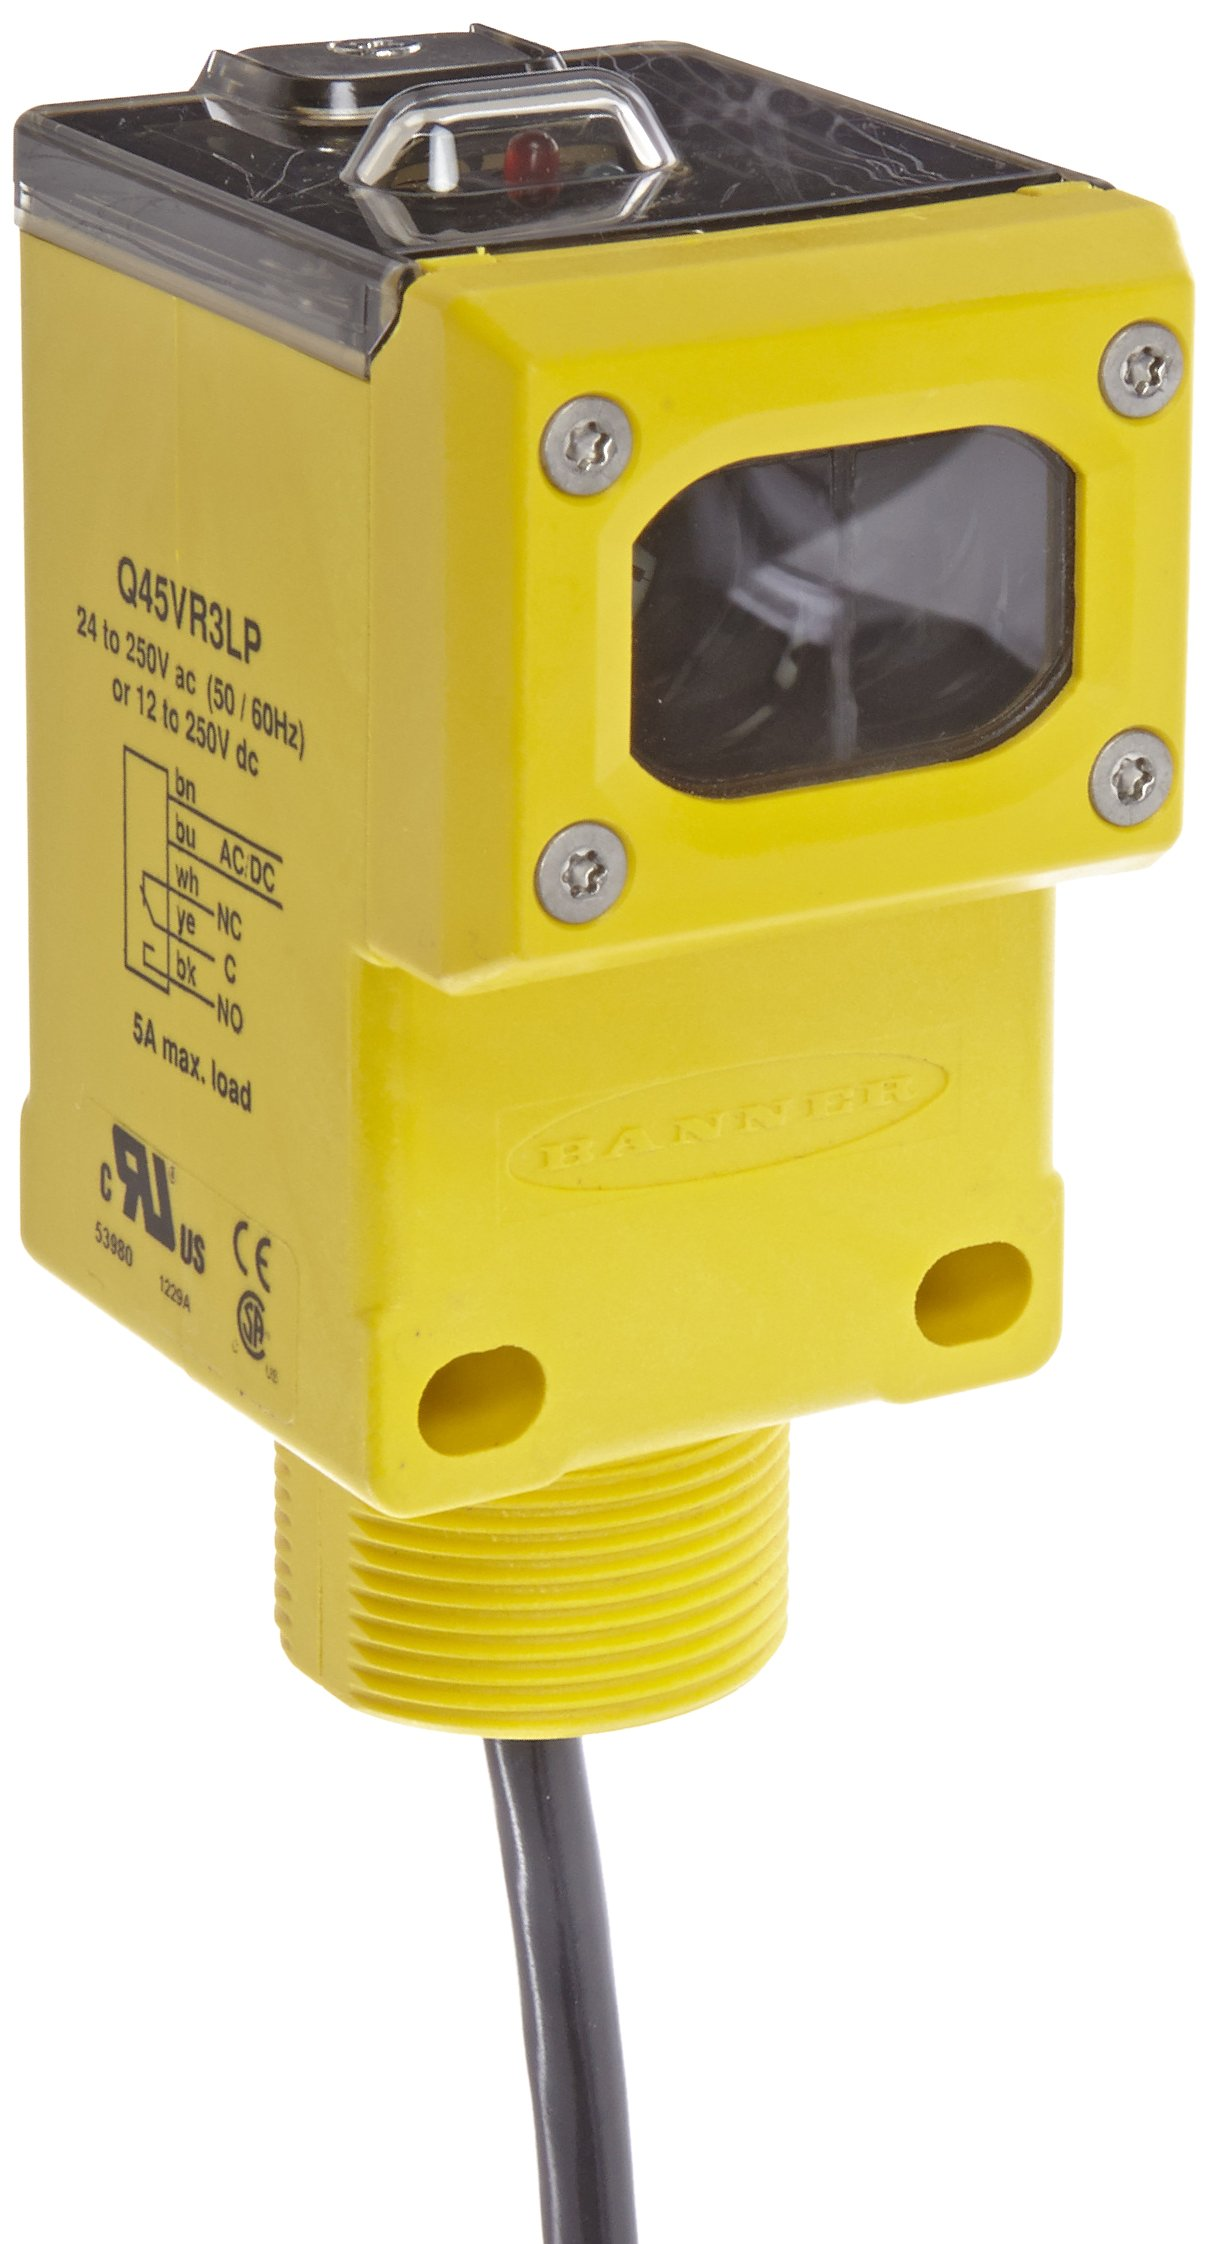 Banner Q45VR3LP Sensor, Retroreflective Mode, Polarized, PNP Output Type, 4-Wire European Style QD, 6m Range, 4 Wires, Universal 12-250VDCor 24-250VAC Supply Voltage,  Cable Length